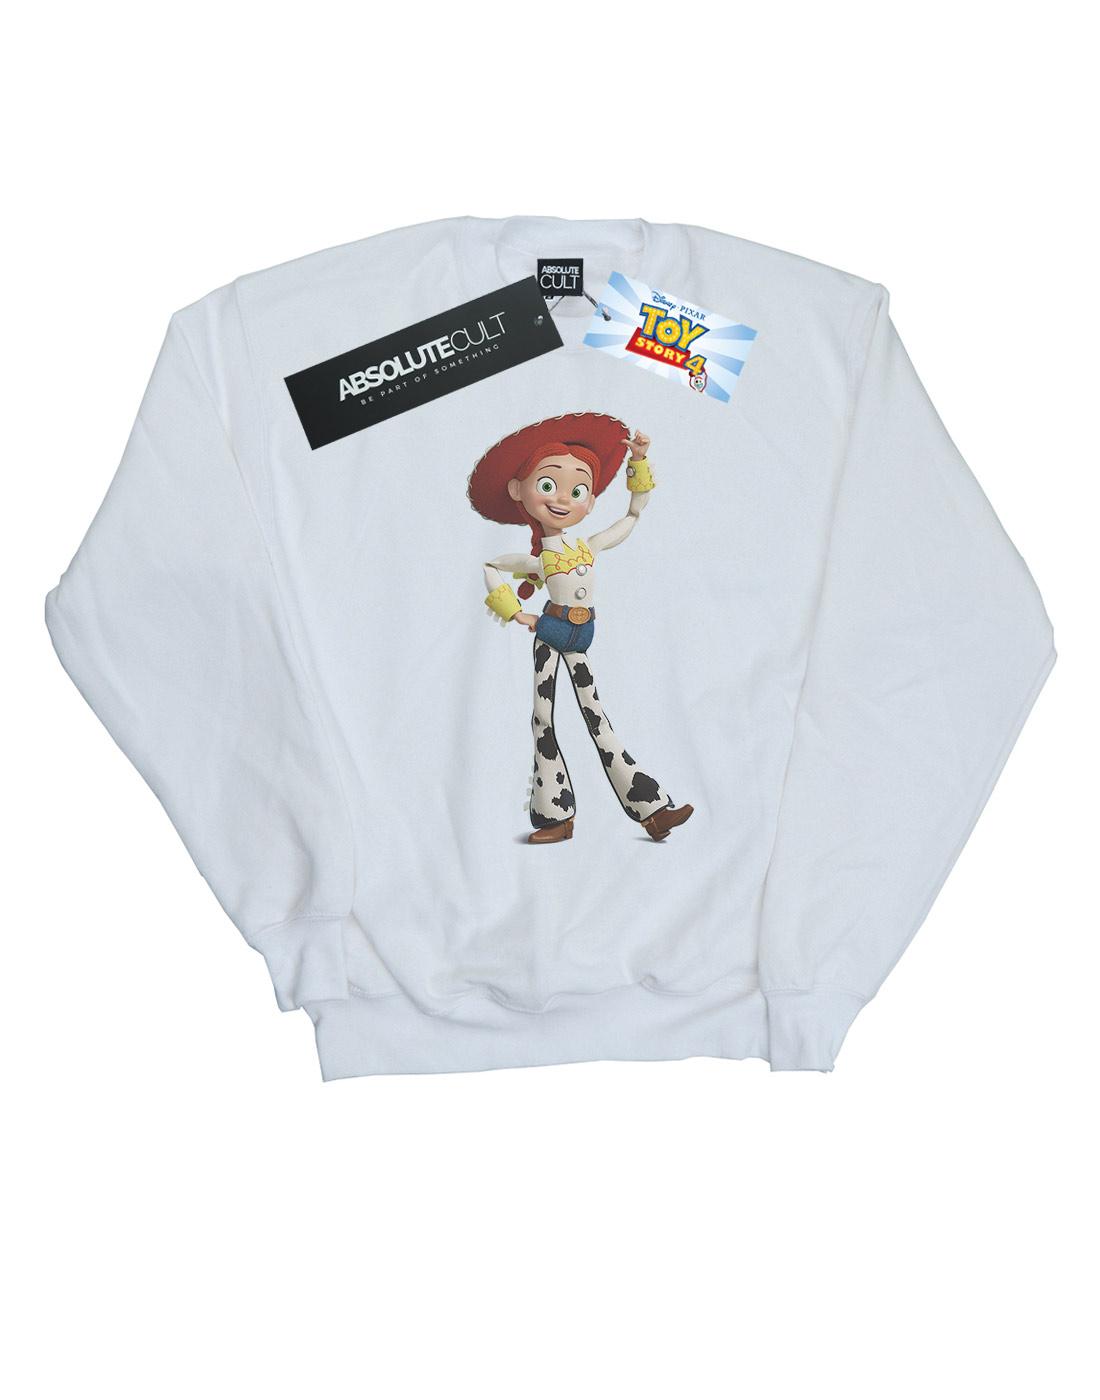 Disney-Girls-Toy-Story-Jessie-Pose-Sweatshirt thumbnail 8